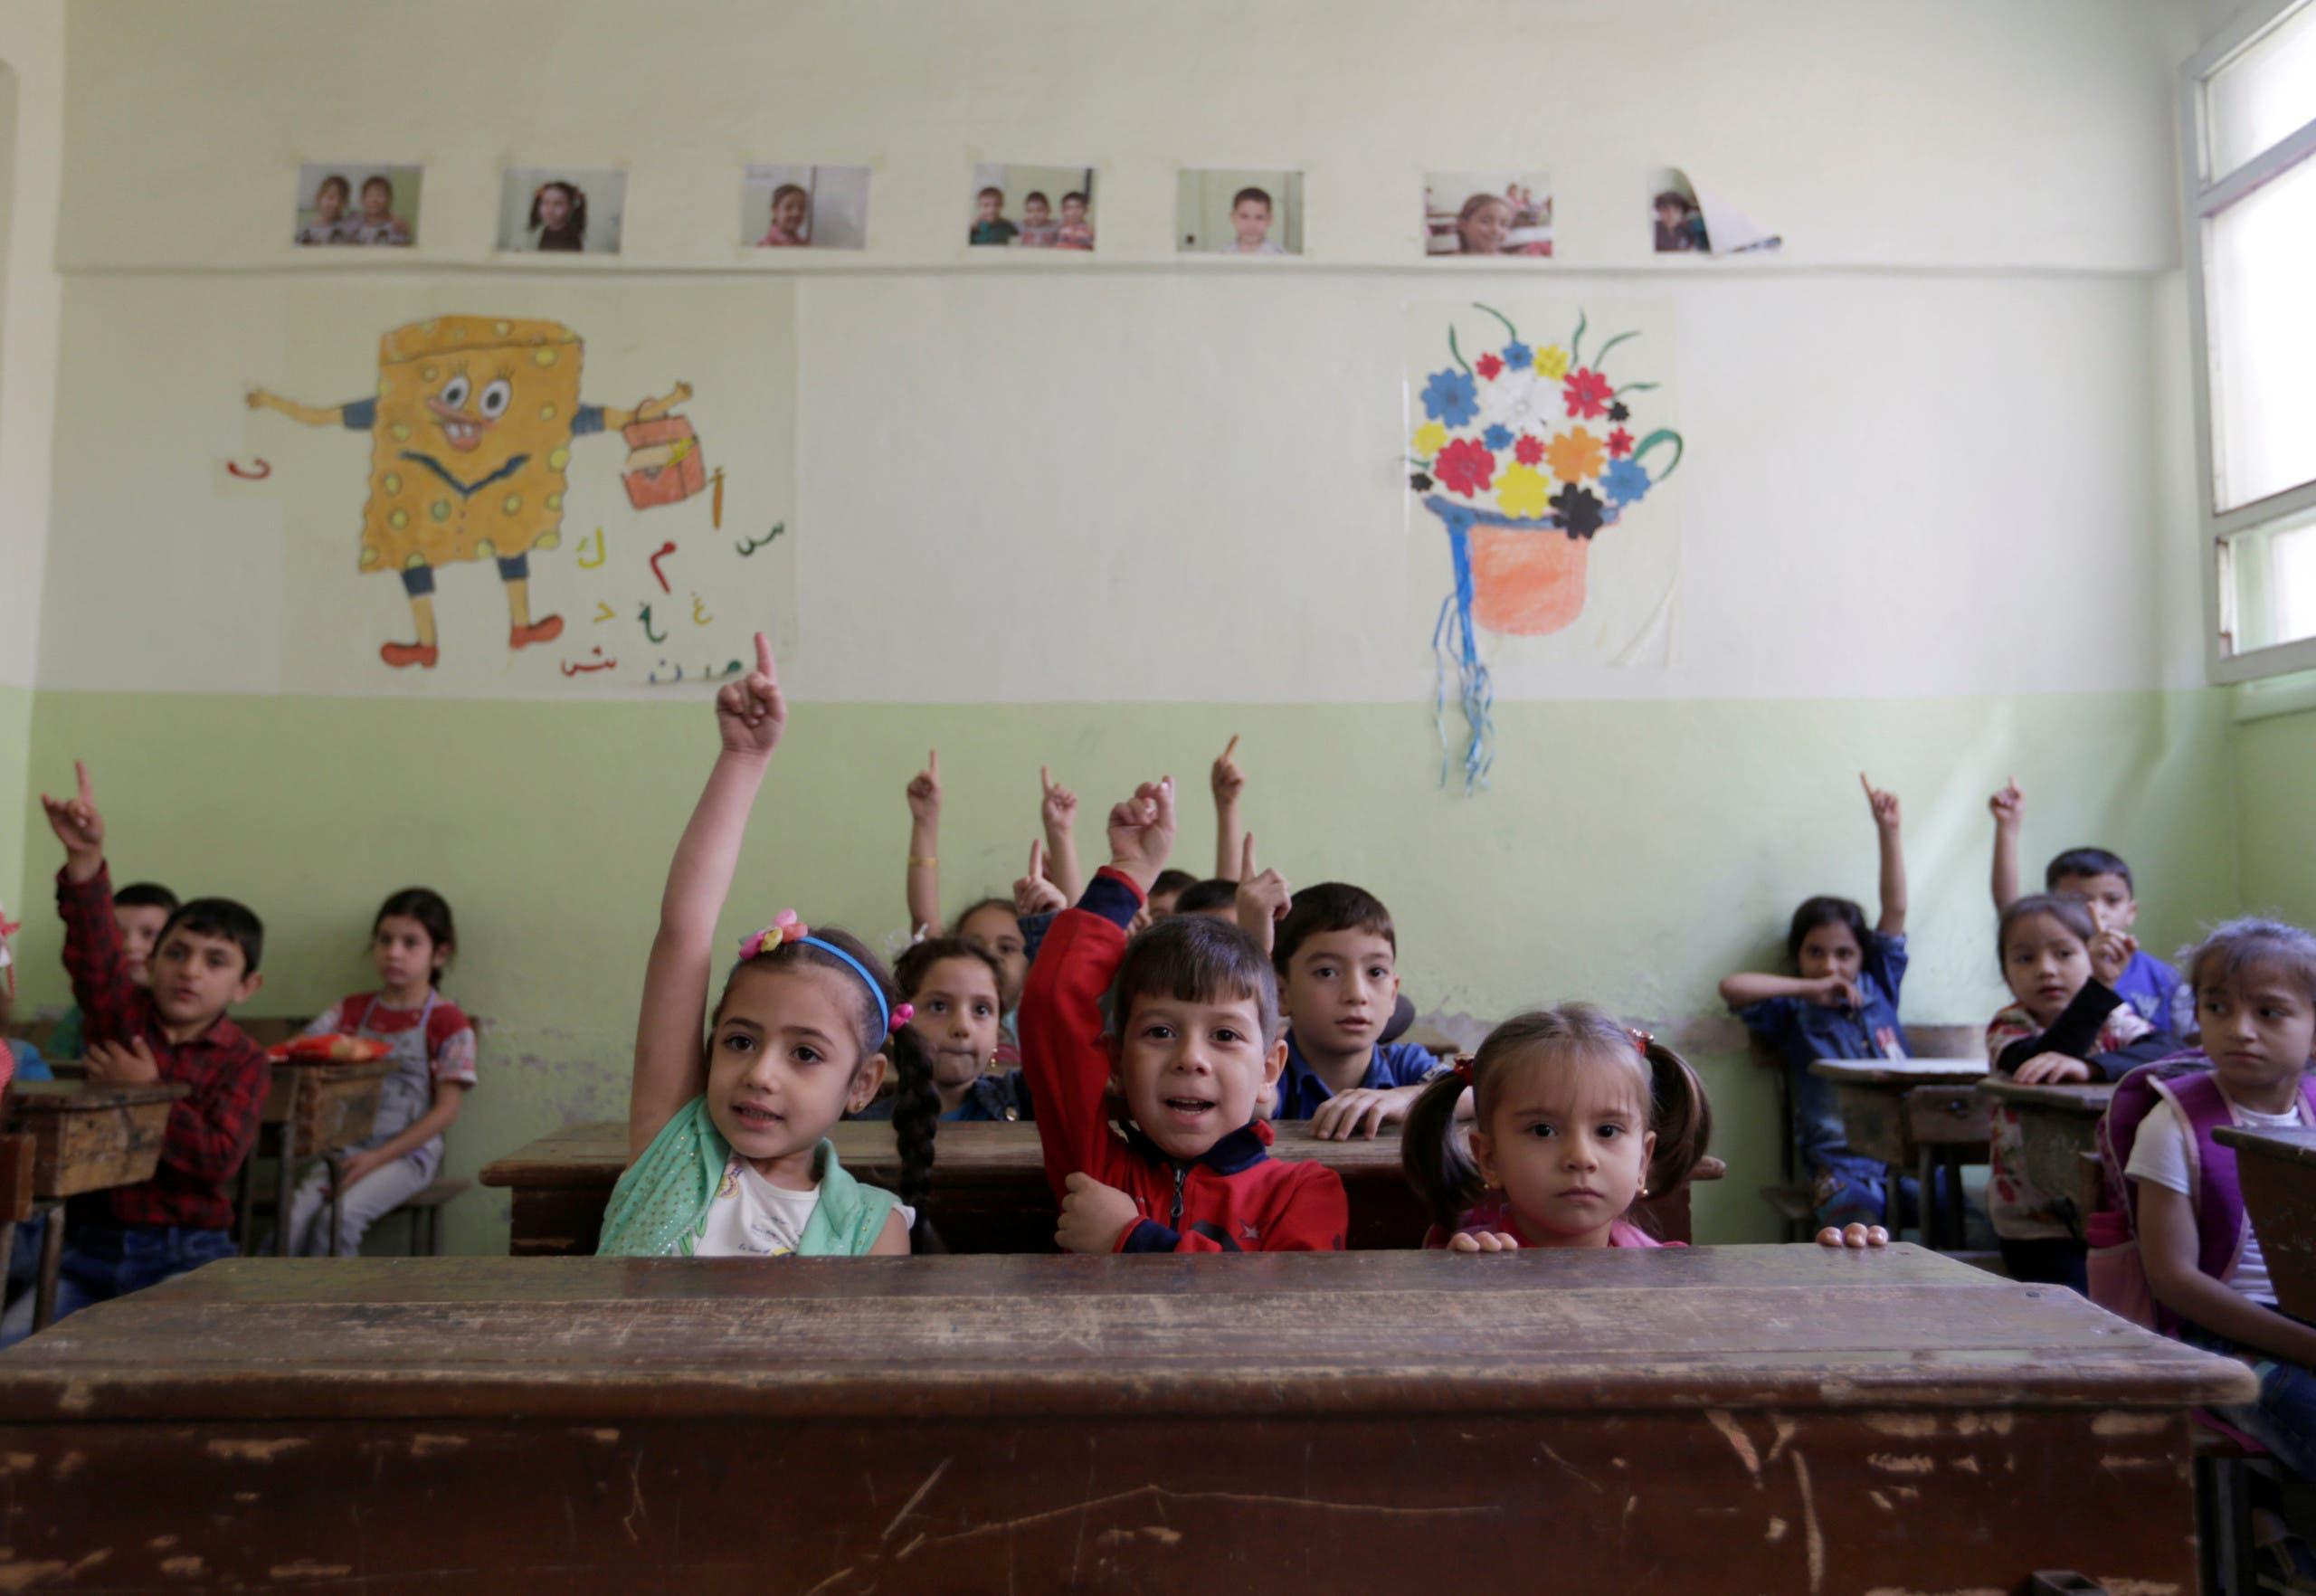 Back to school in Syria's Maaret al-Numan